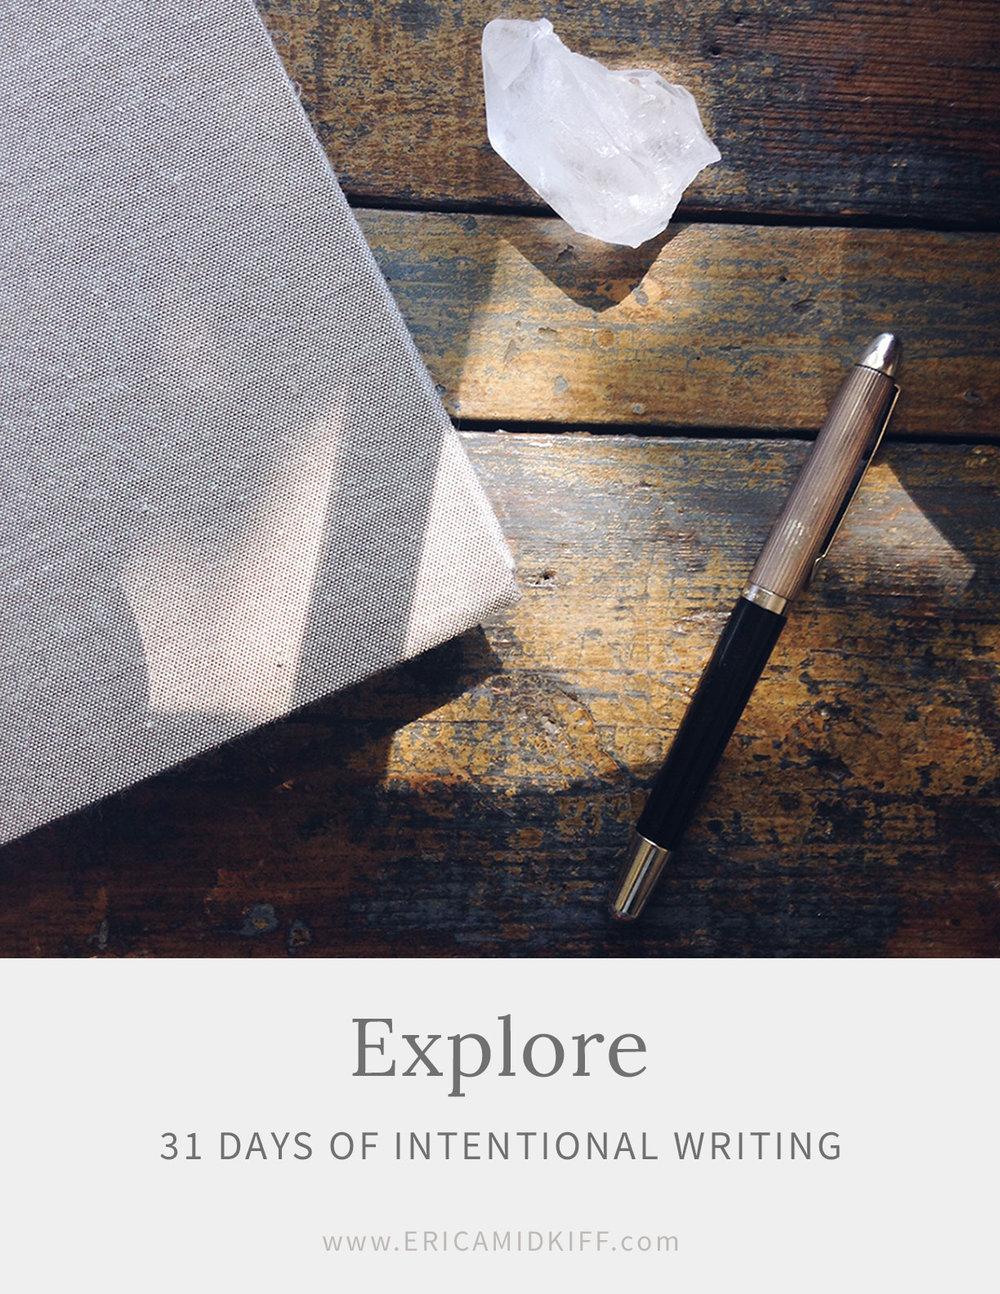 Explore--31-Days-of-Intentional-Writing--Erica-Midkiff.jpg